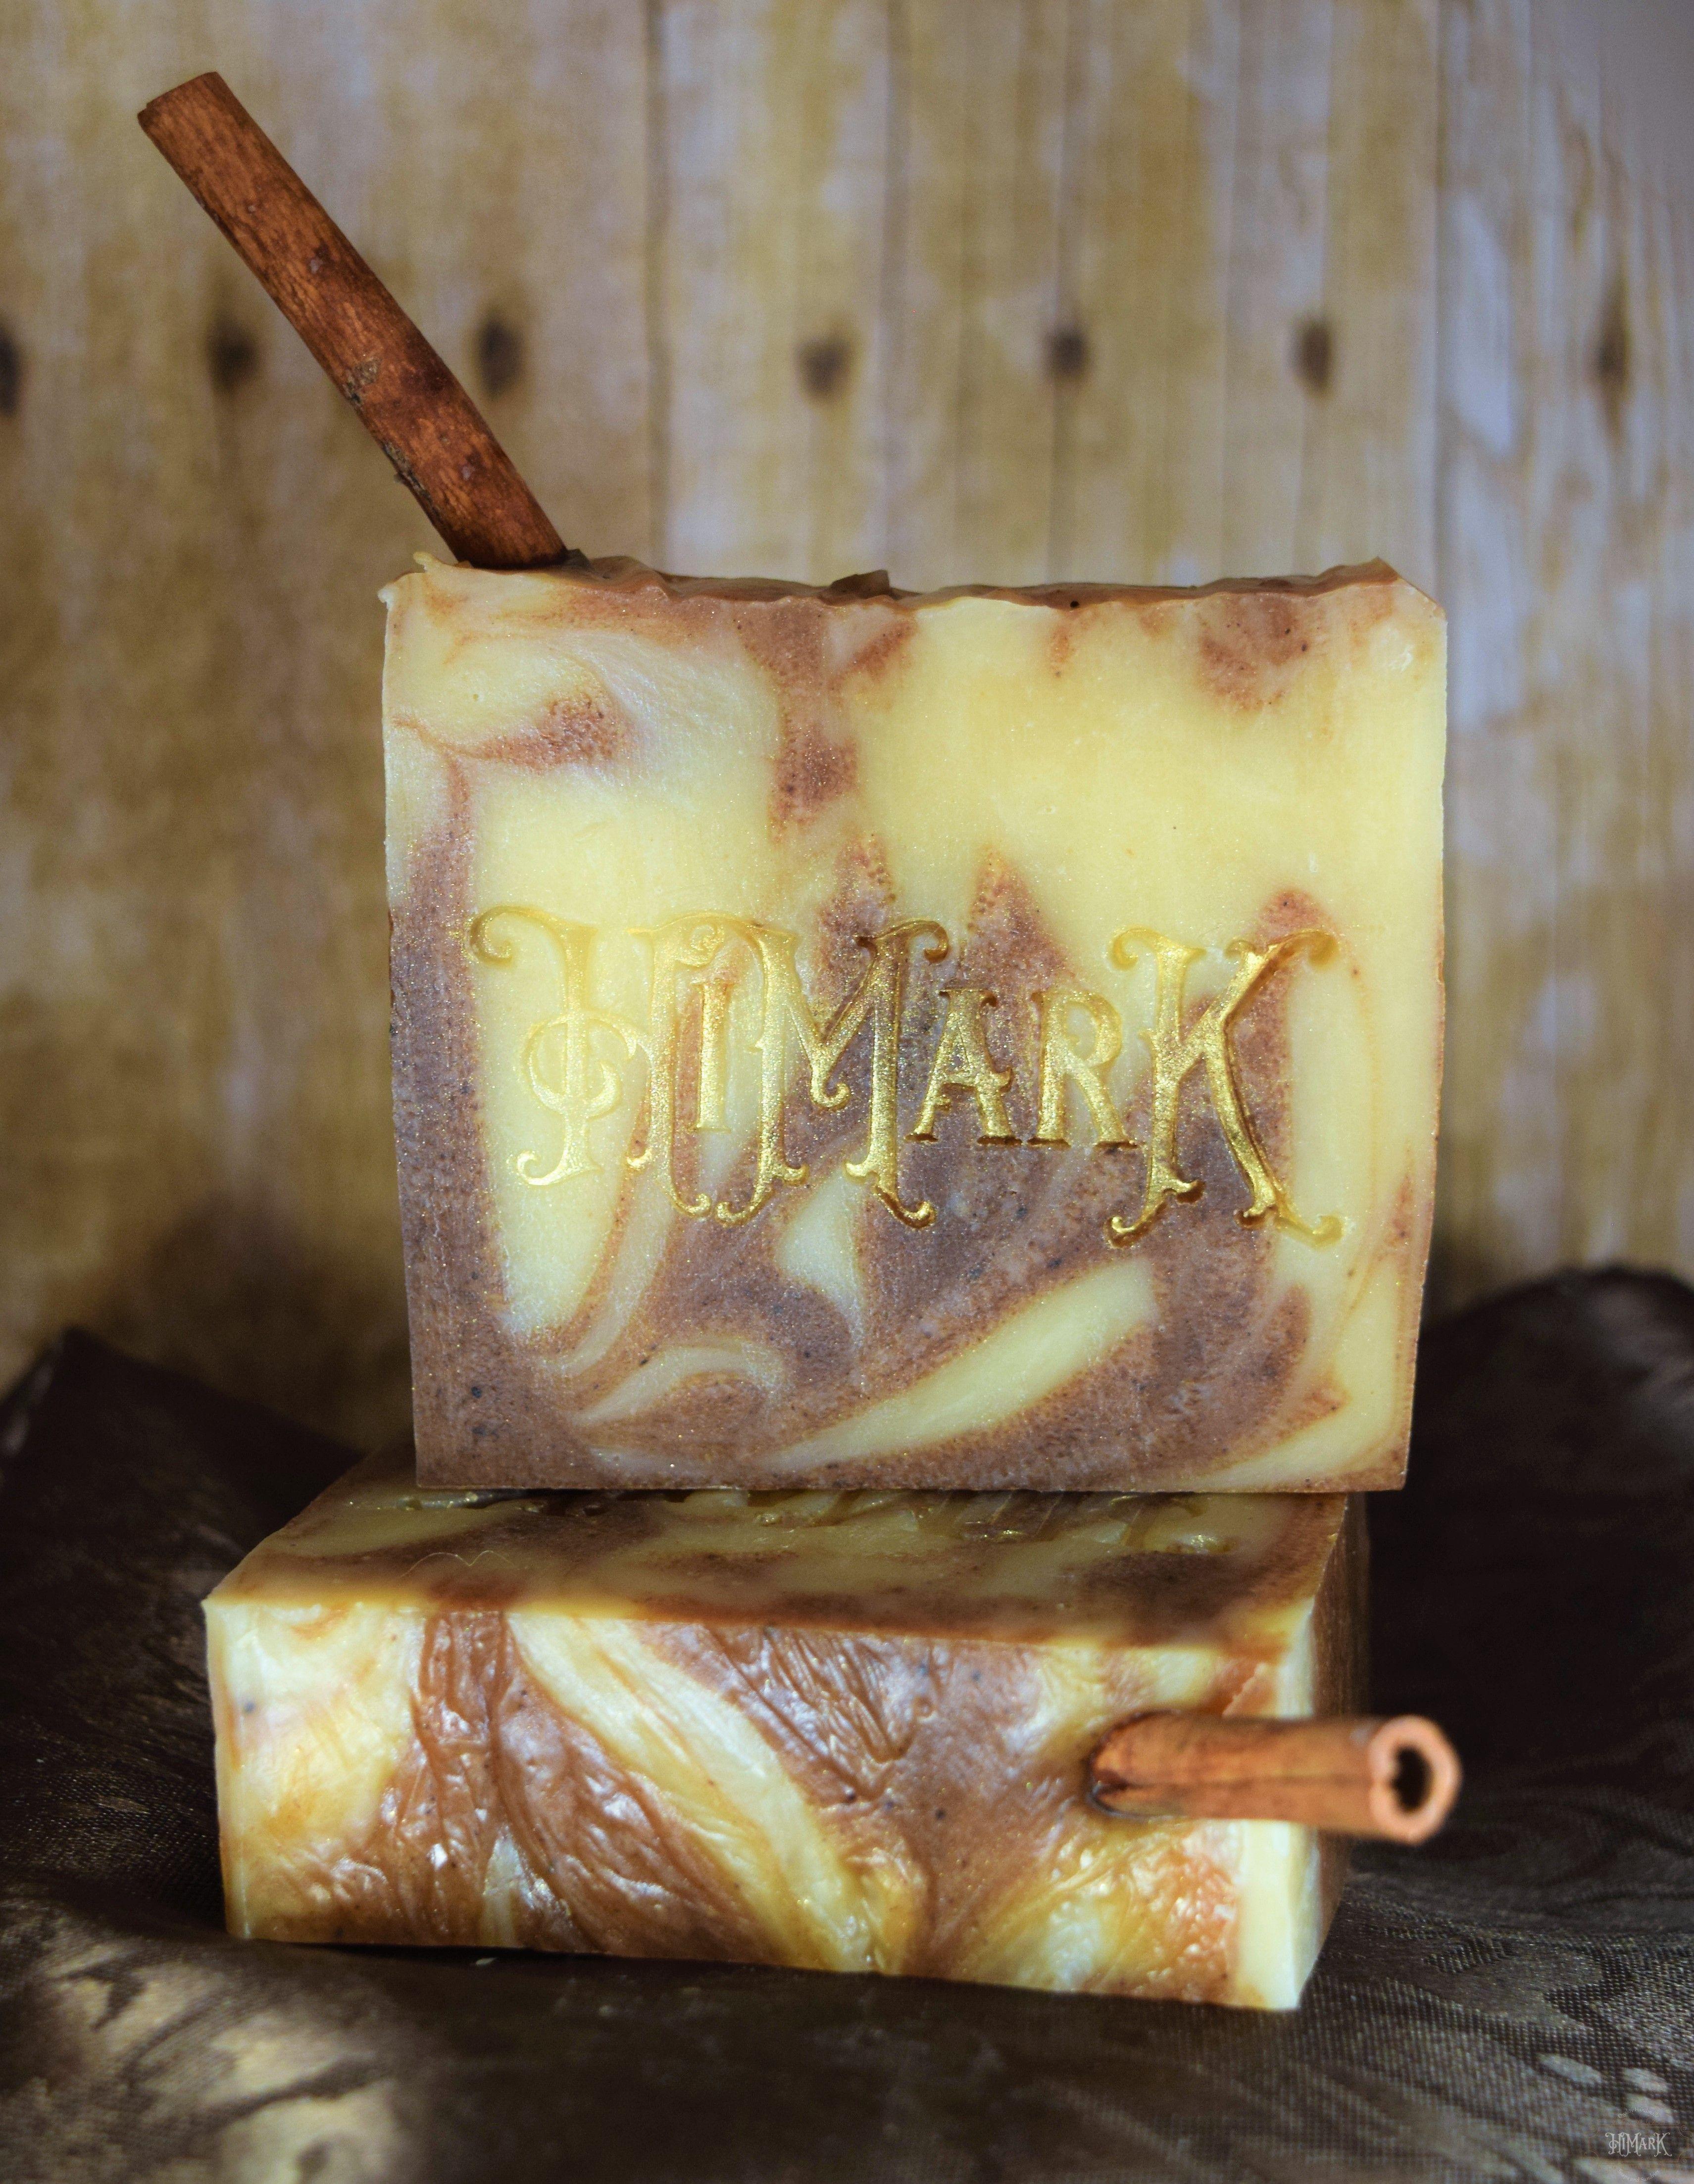 Carmenus spice cake himark soaps and sundries pinterest